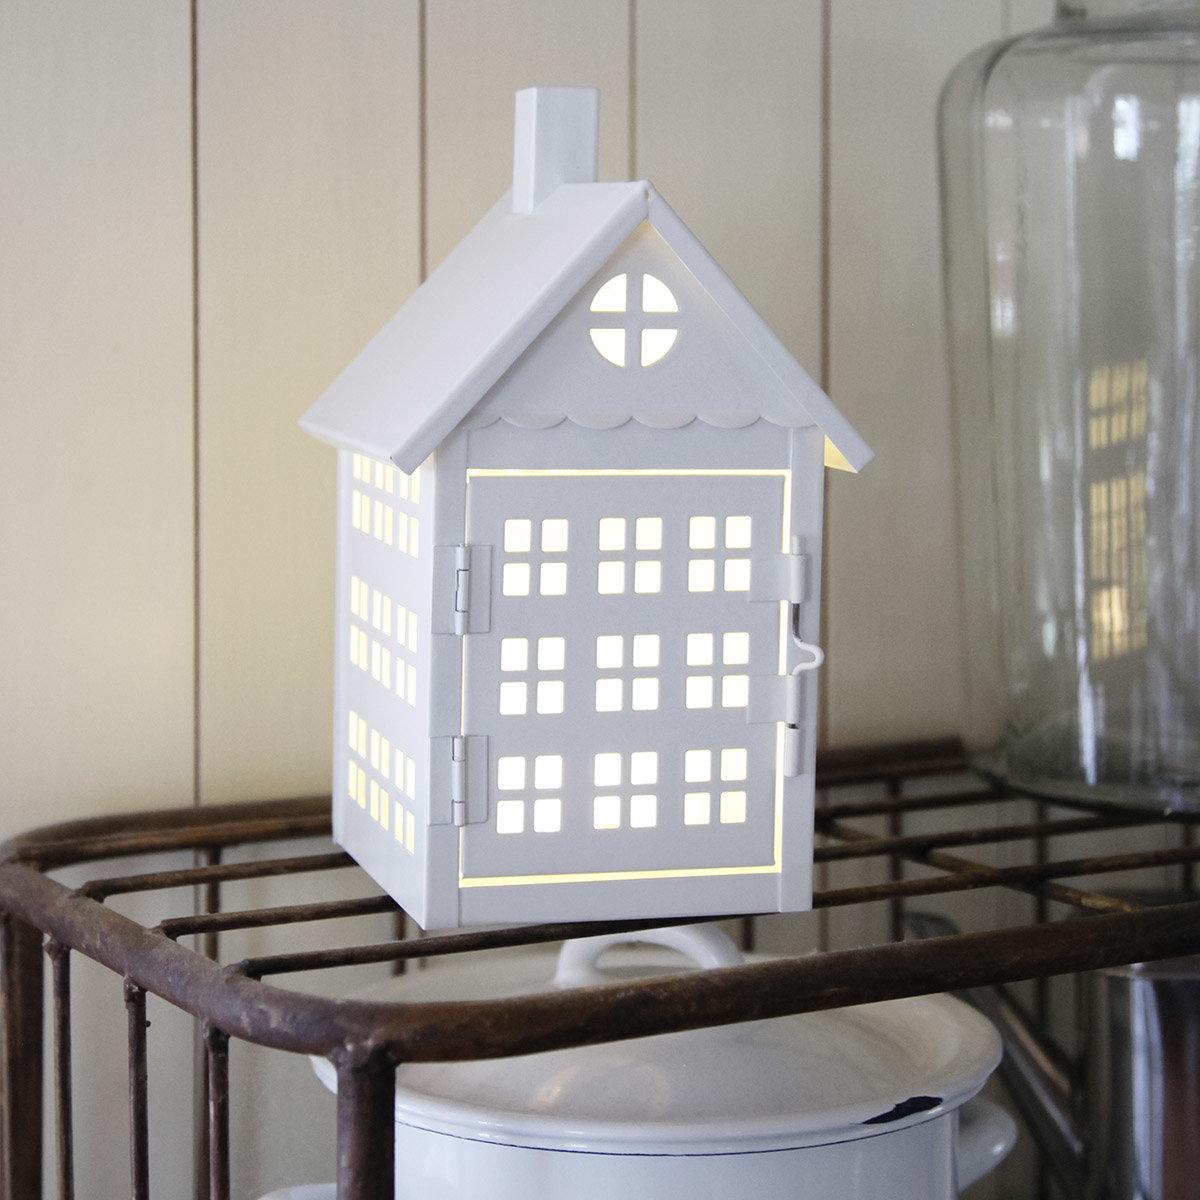 LED-Haus Winter Time, klein | #2